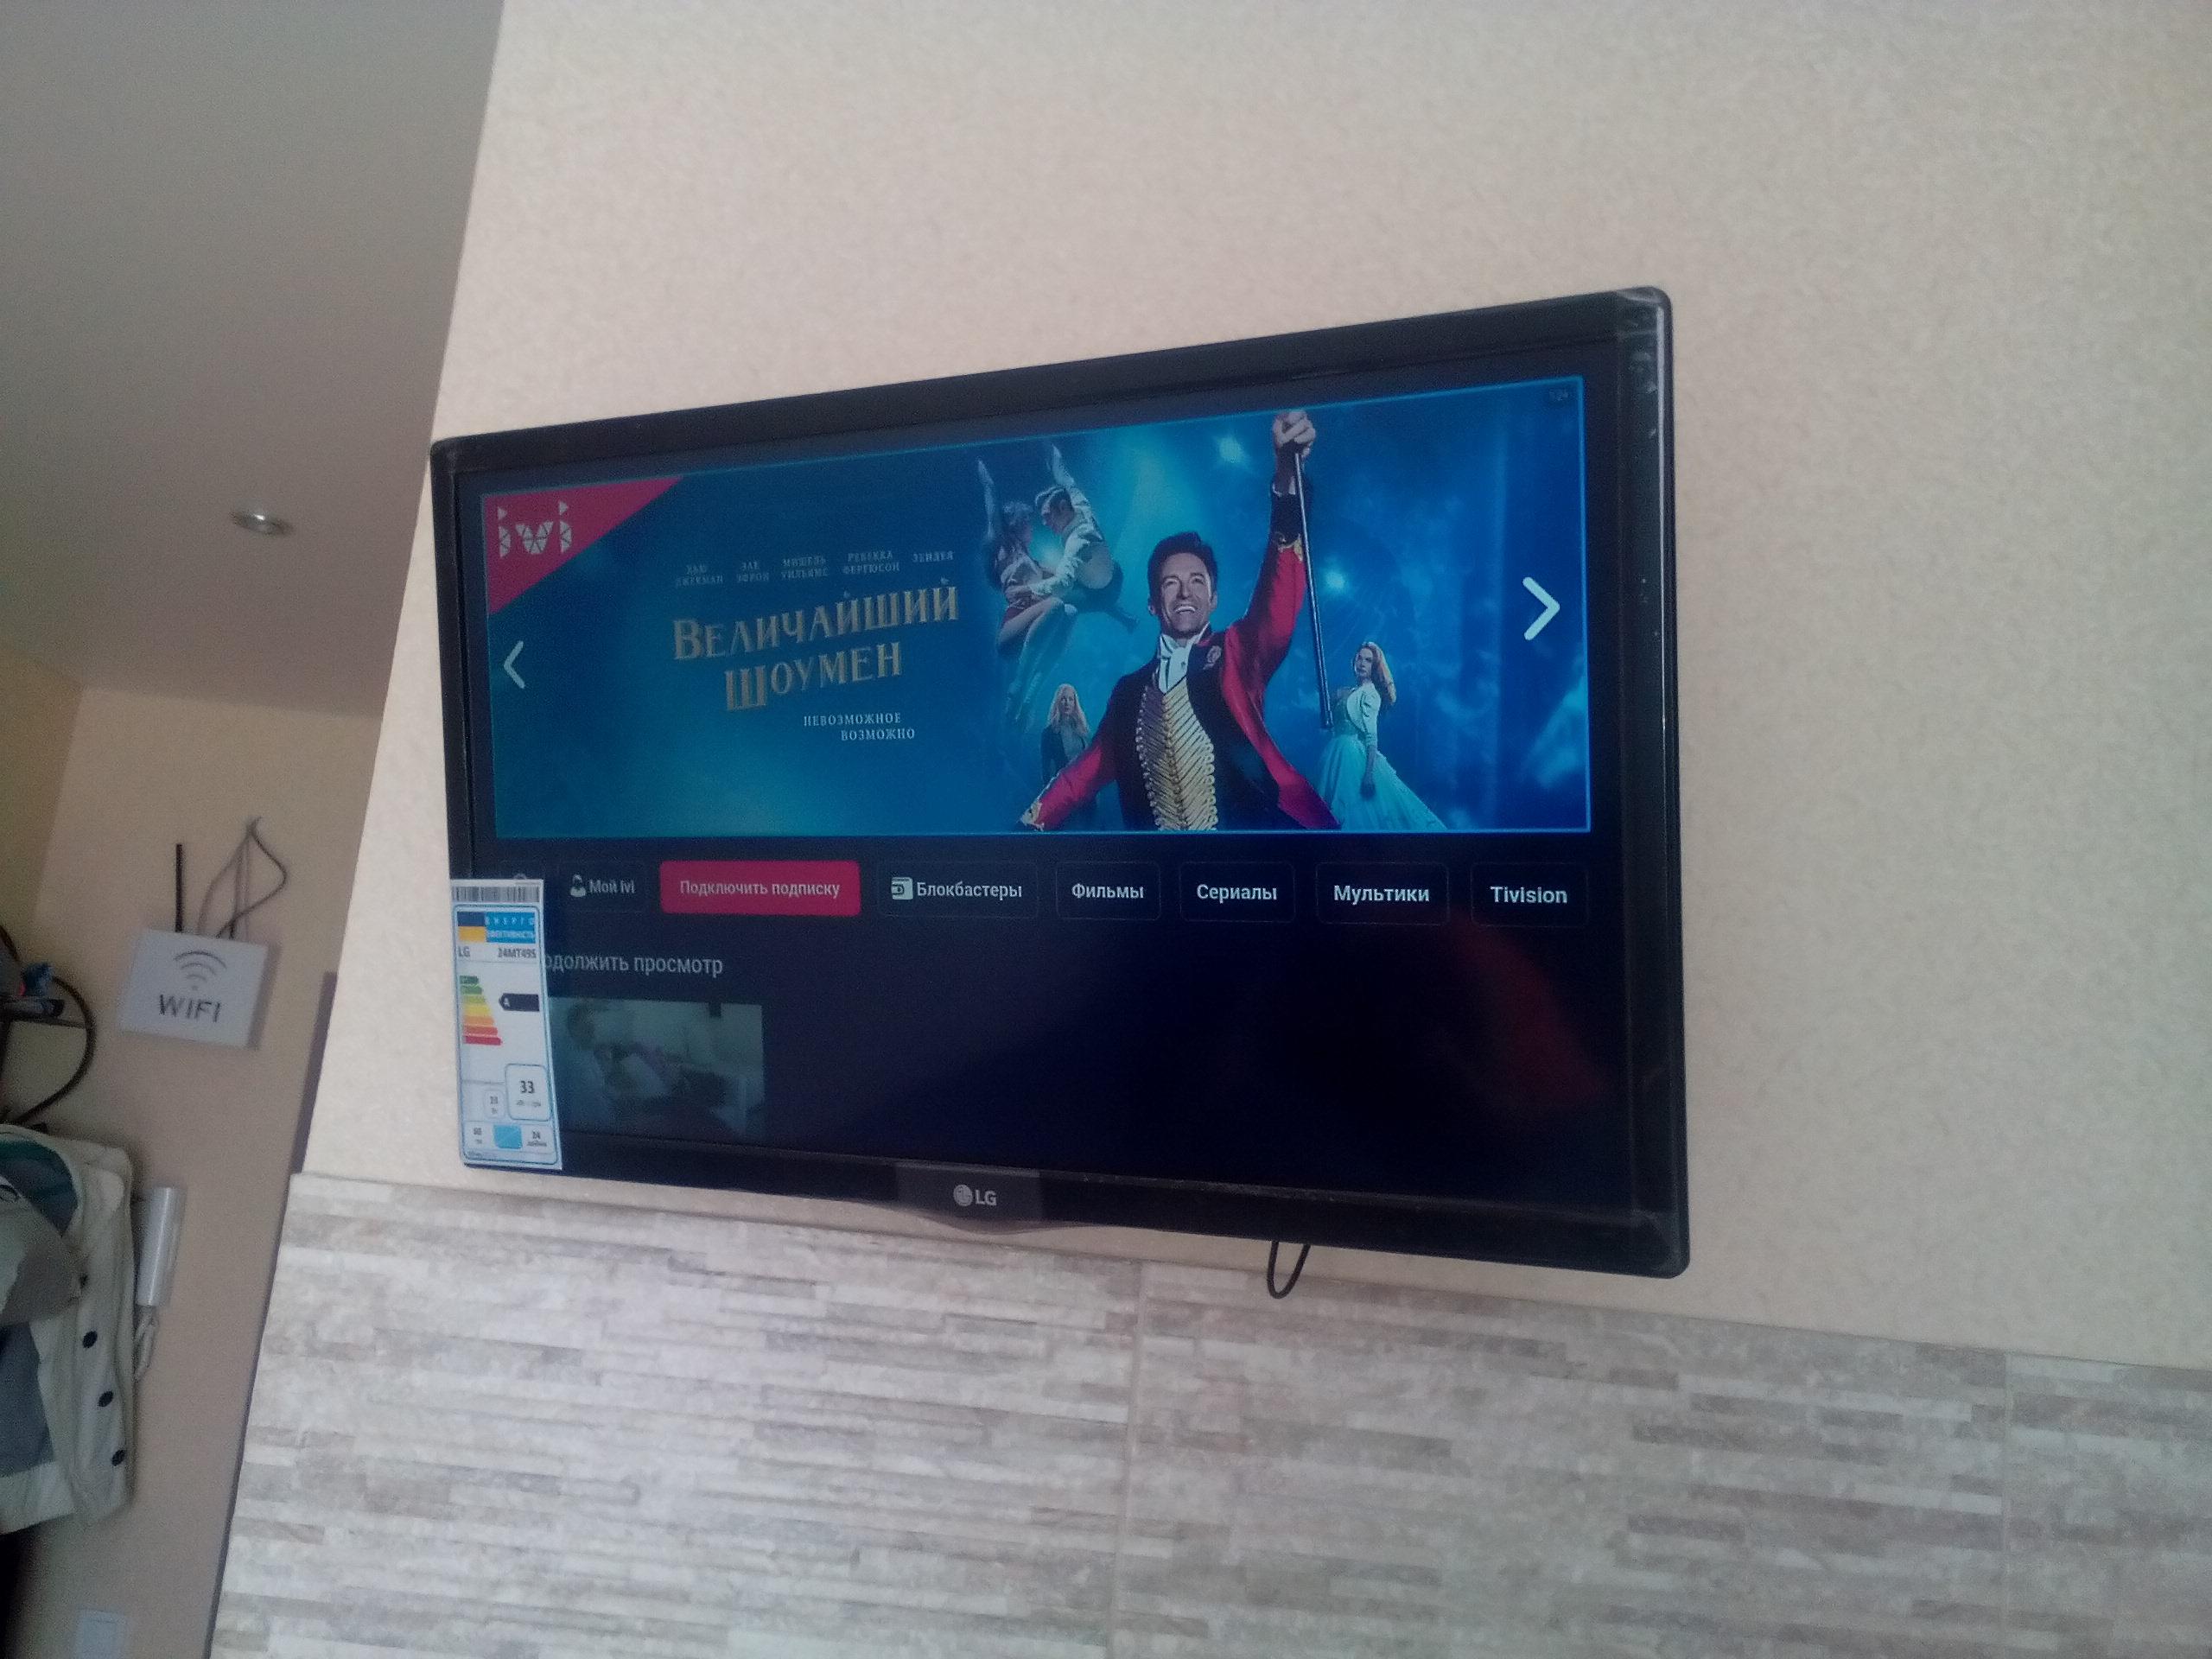 Фото Монтаж телевизора на стену